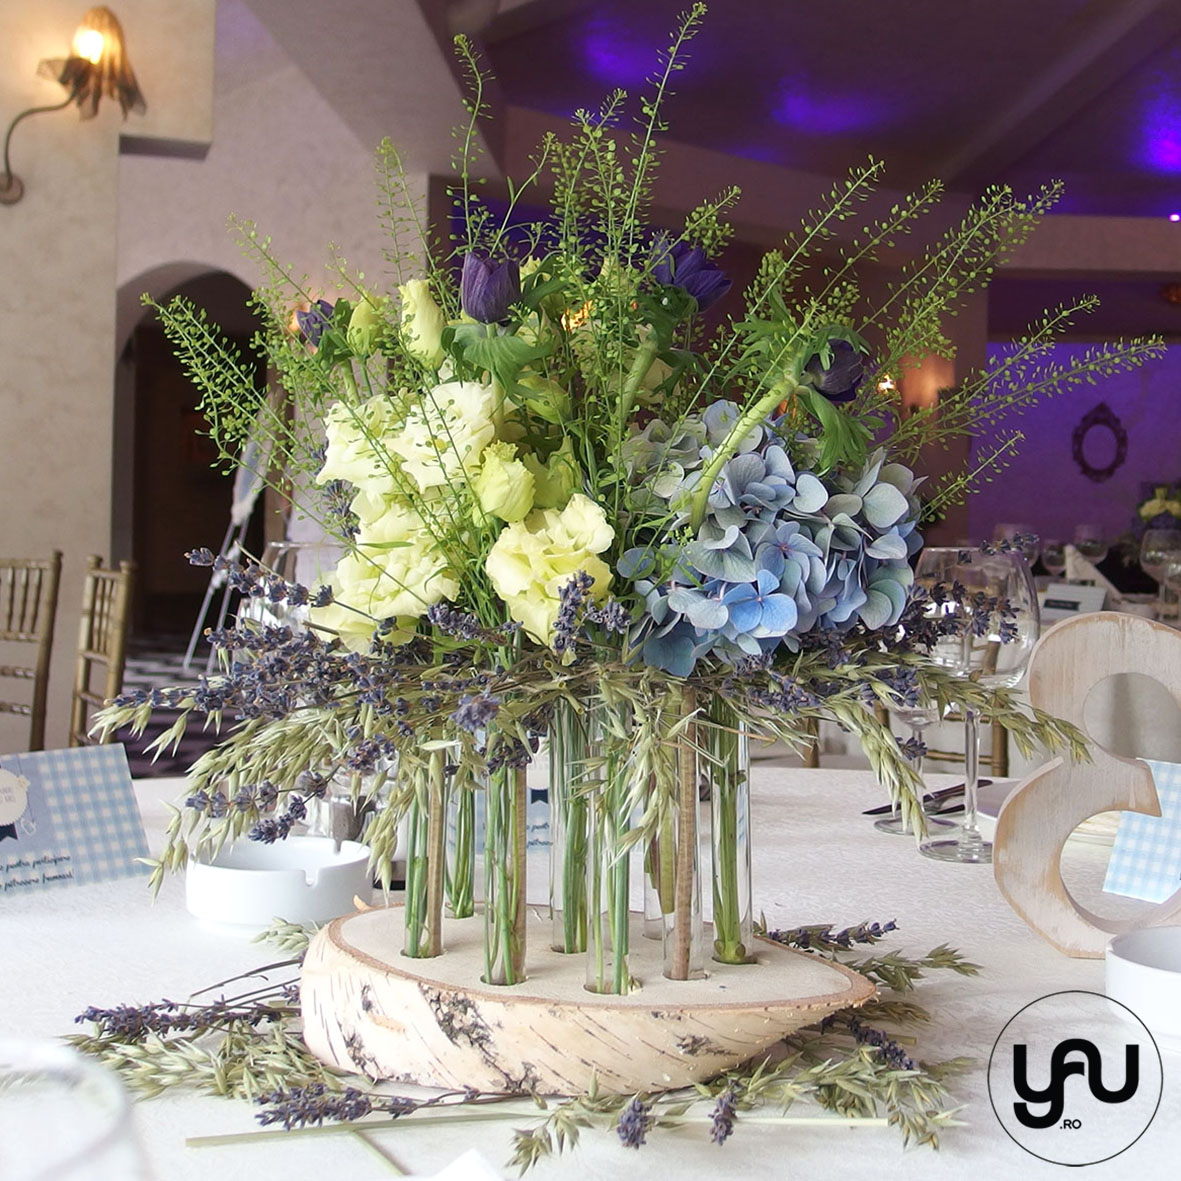 BOTEZ cu anemone albastre _ yau events _ yau concept _ elena toader _ la seratta (8)